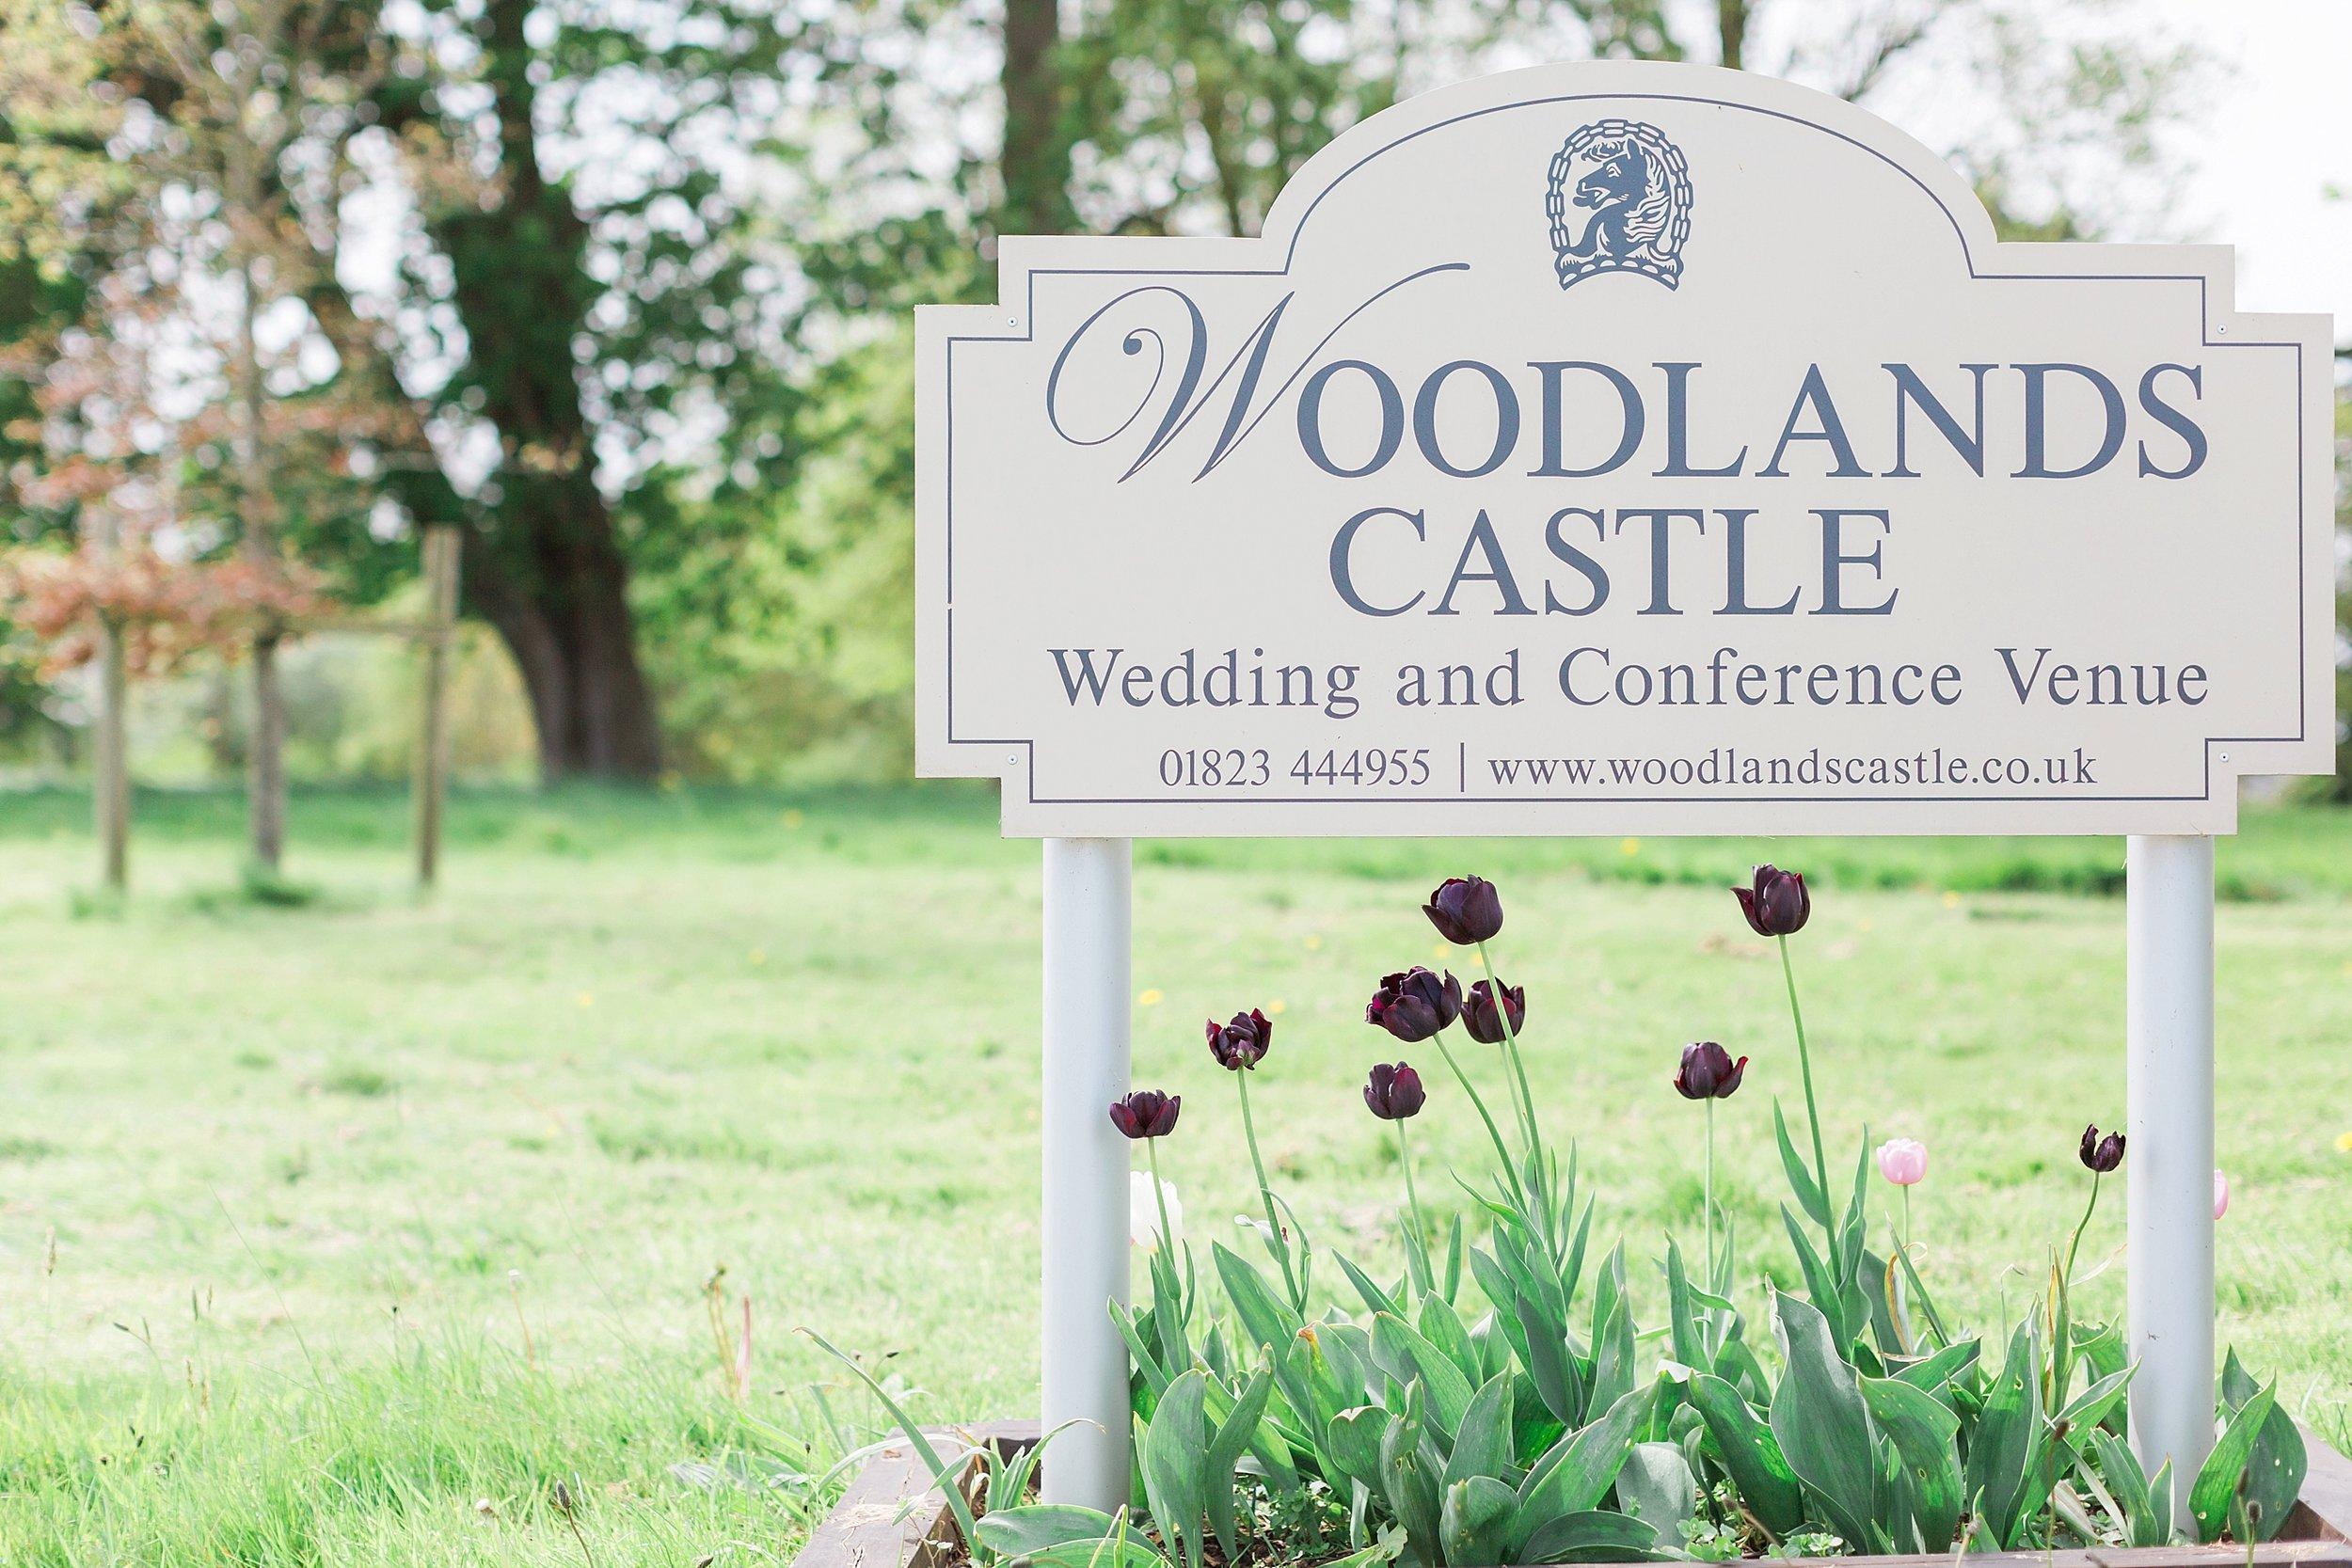 woodlands castle taunton.jpg